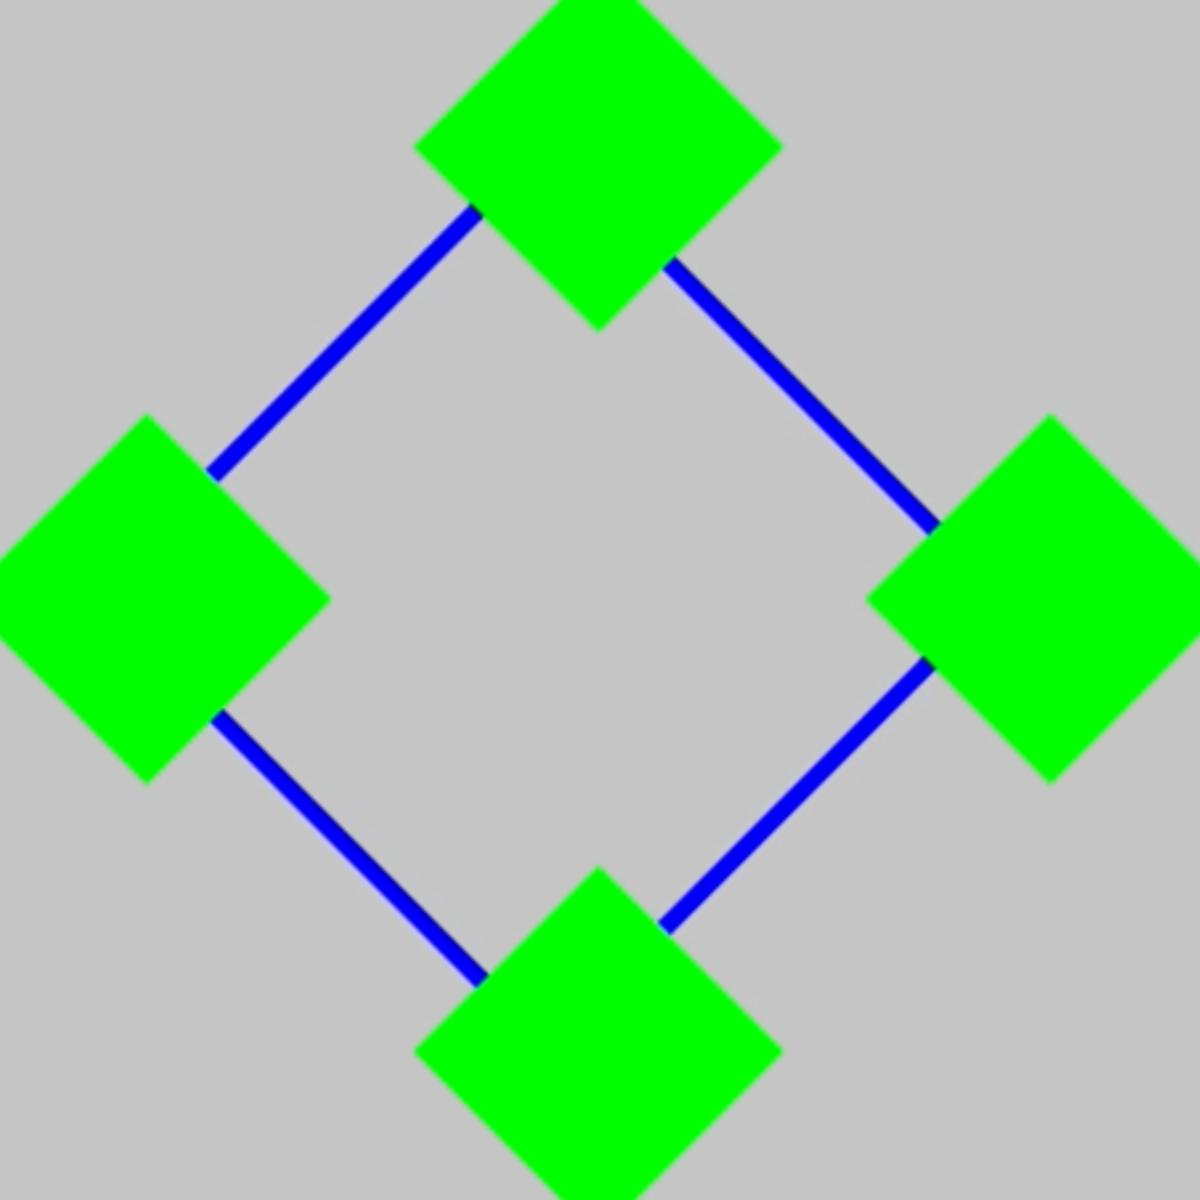 motion_binding_illusion_0.png